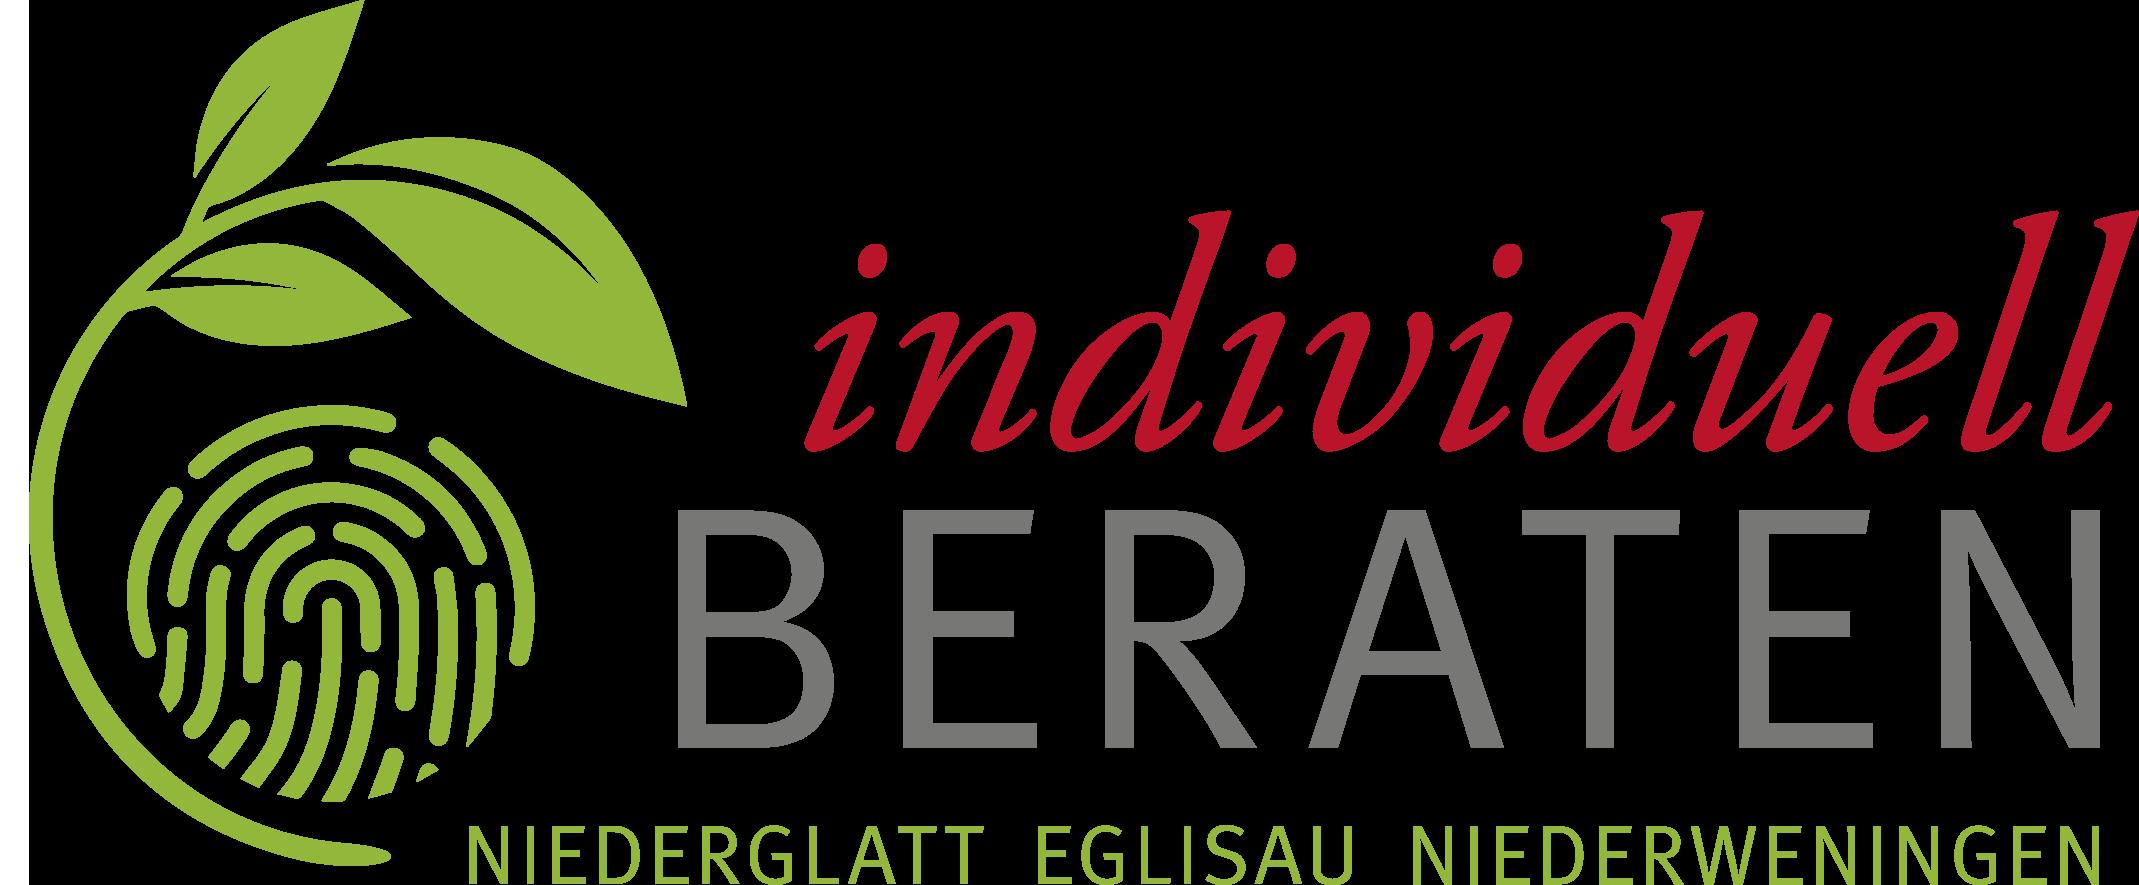 logo_individuell_beraten_farbig.png